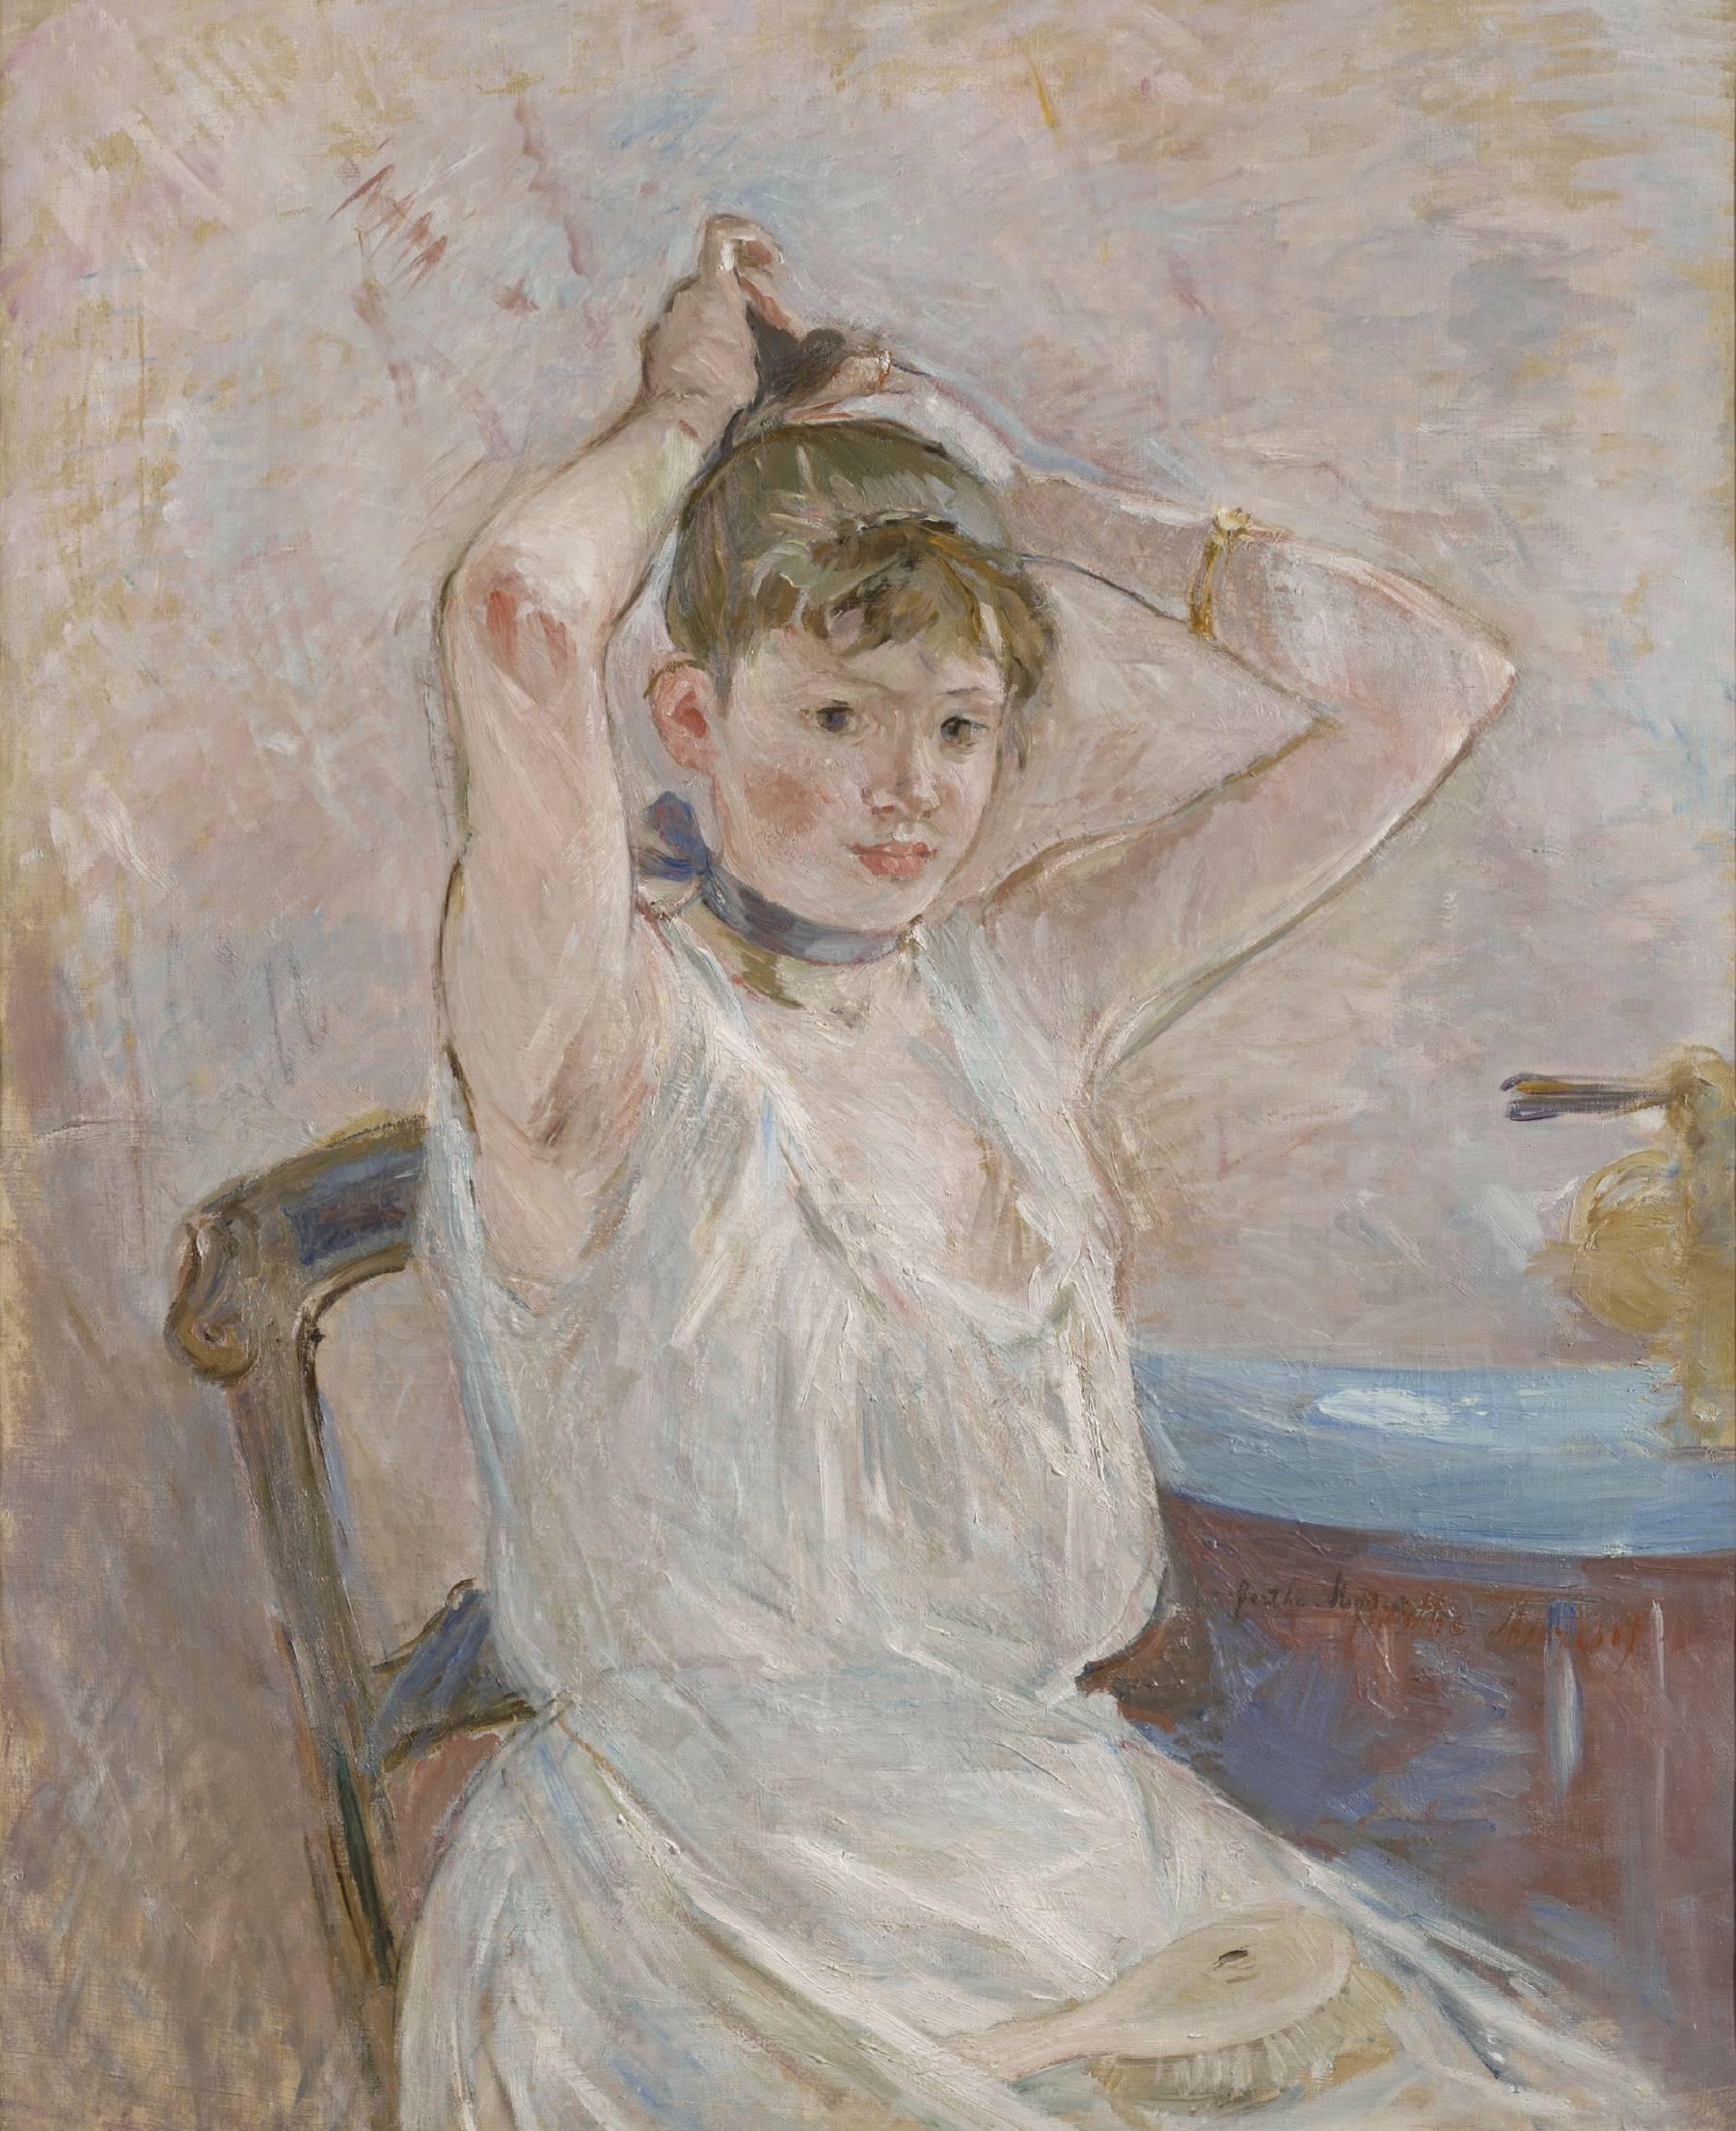 Berthe Morisot, Le Bain